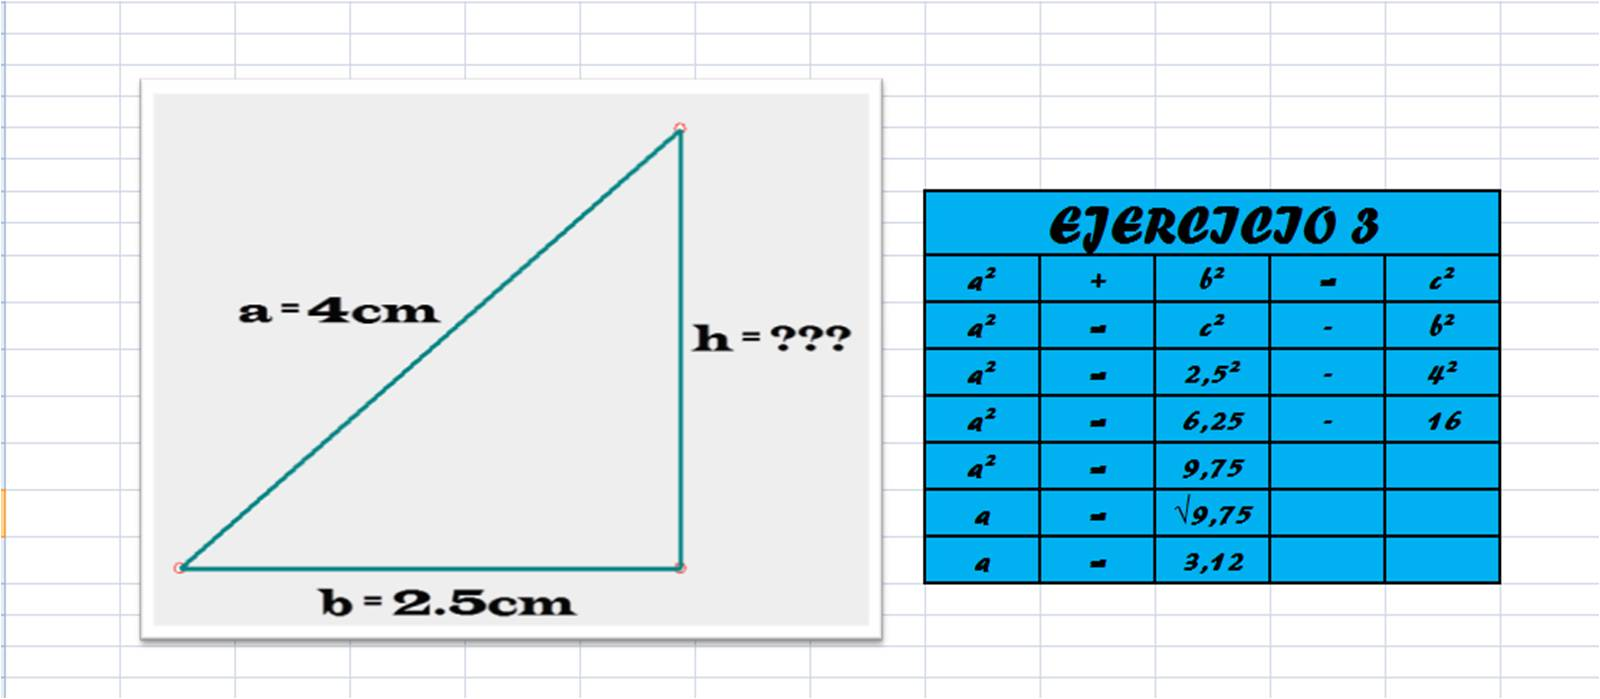 Nicolas martinez vargas 11 02 1 3 6 teorema de pitagoras - Tamano televisor distancia ...